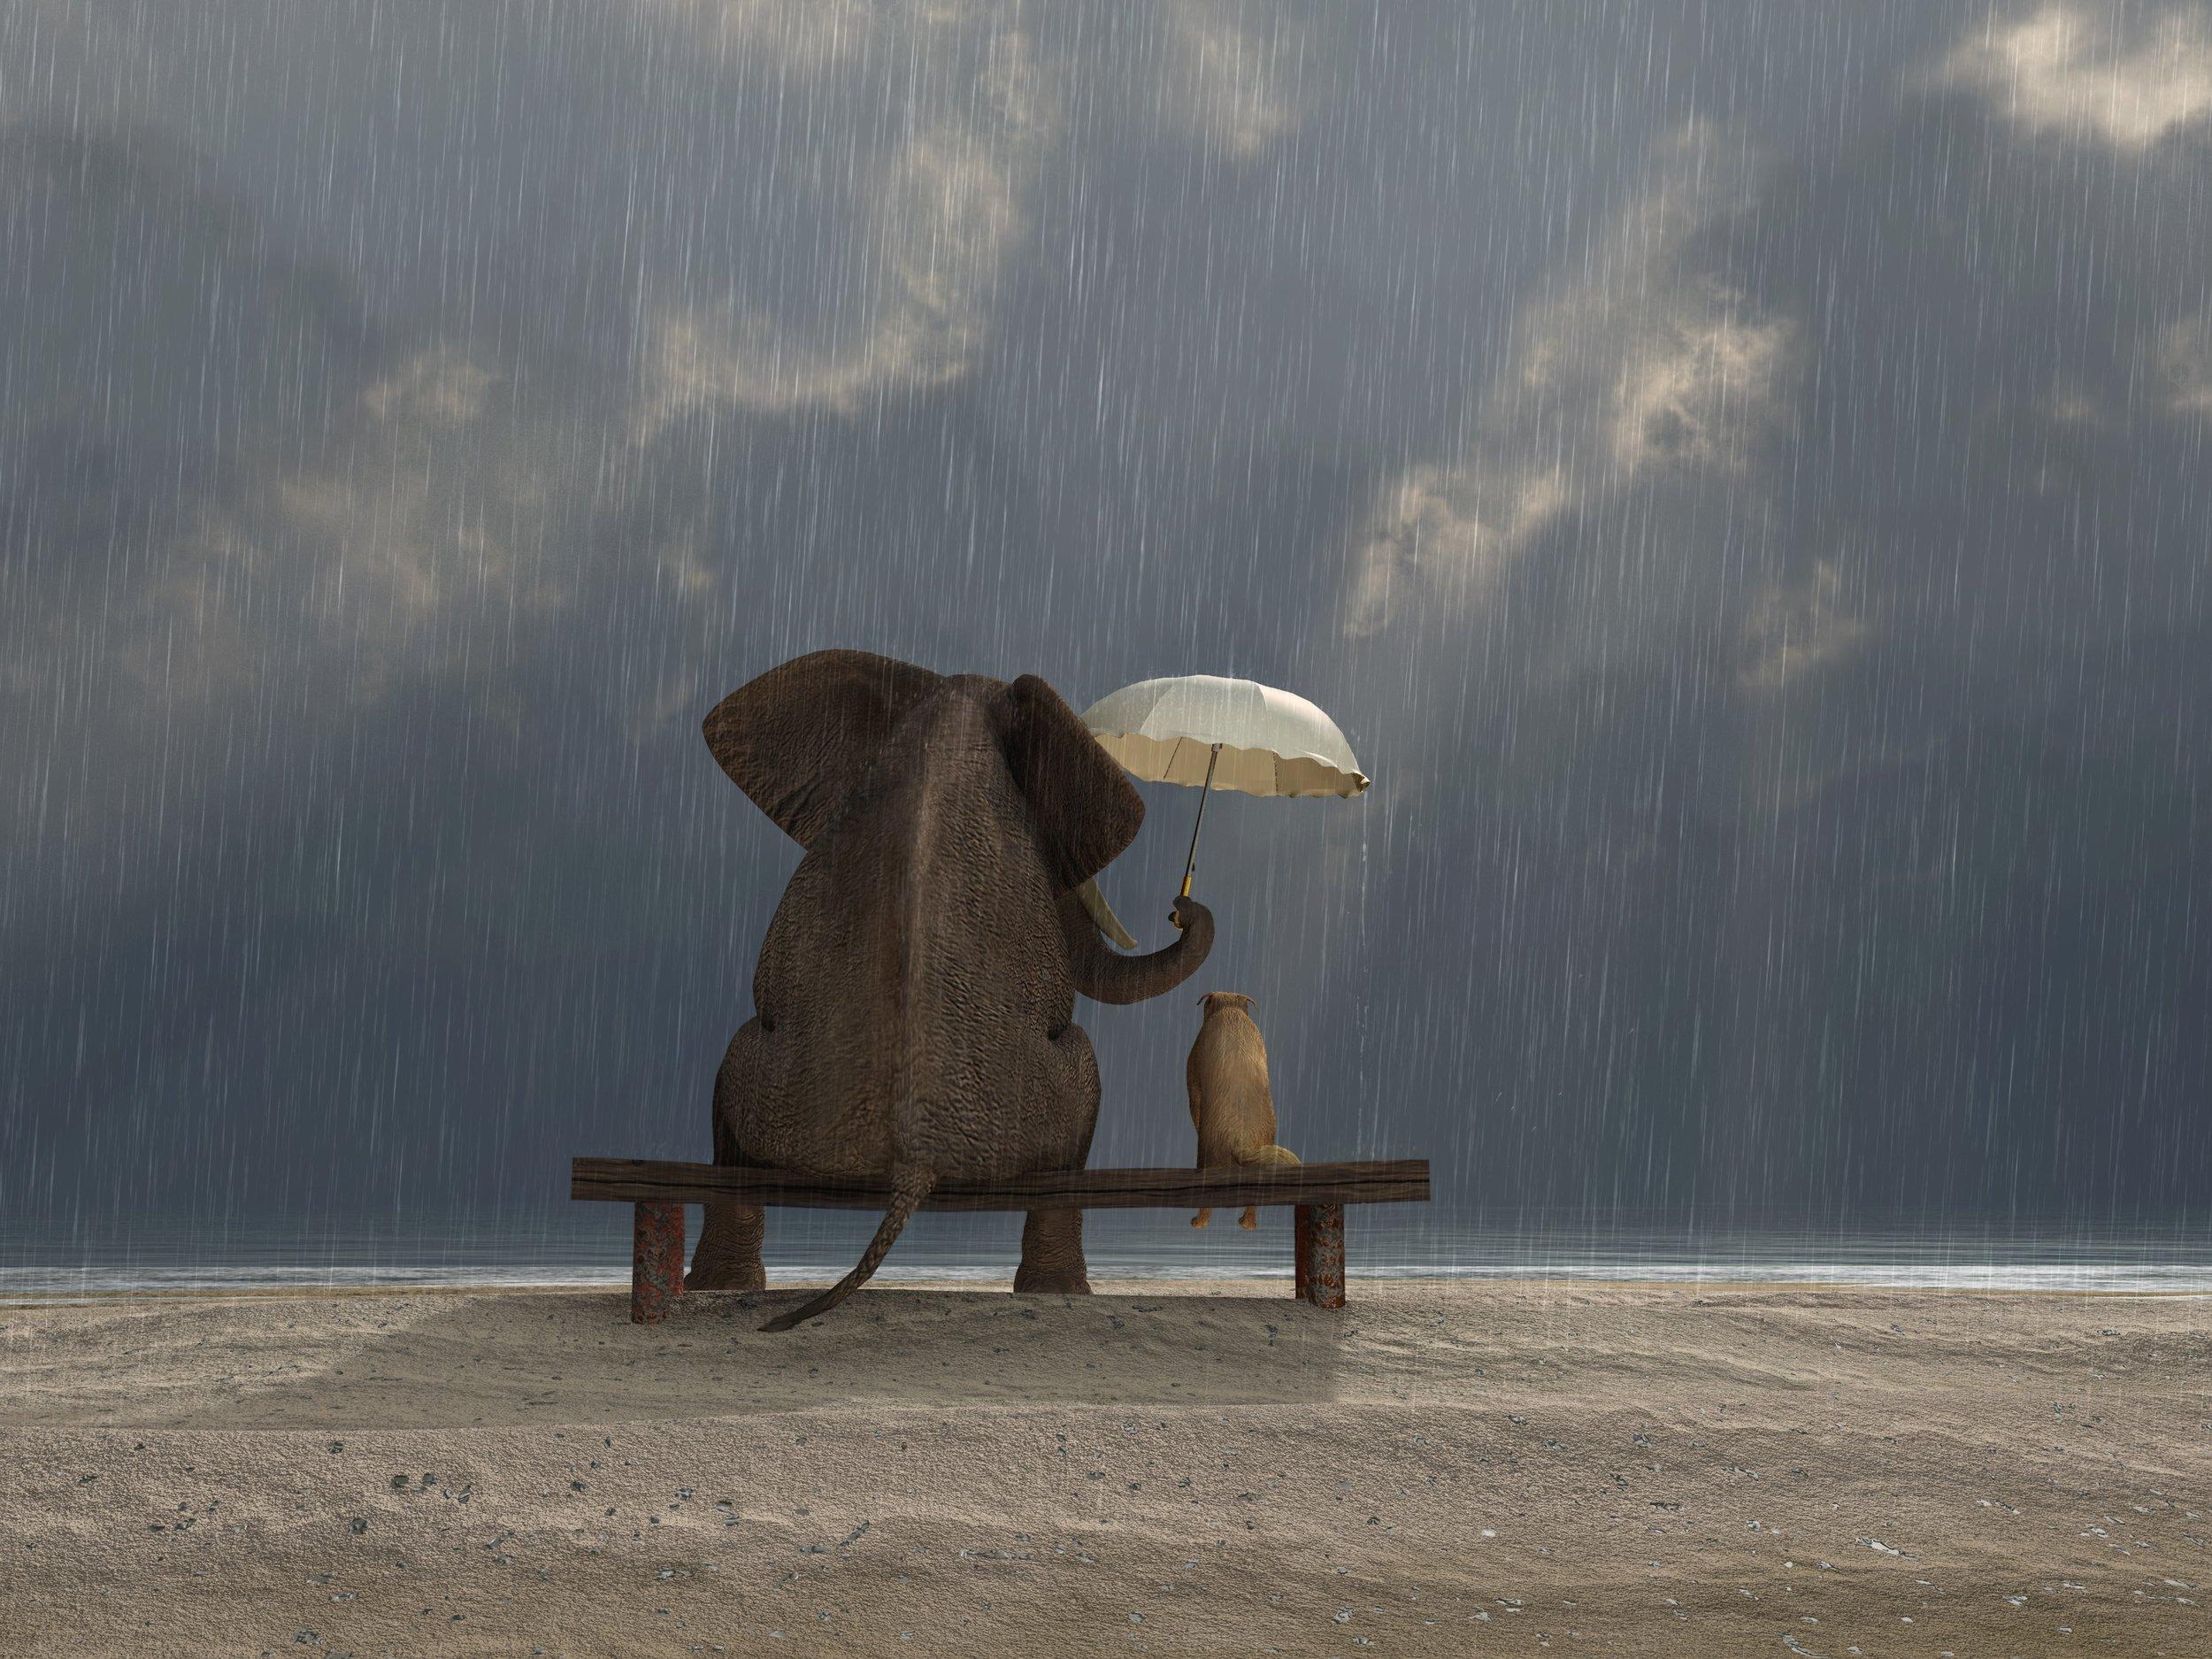 Elephant-and-Dog.jpg